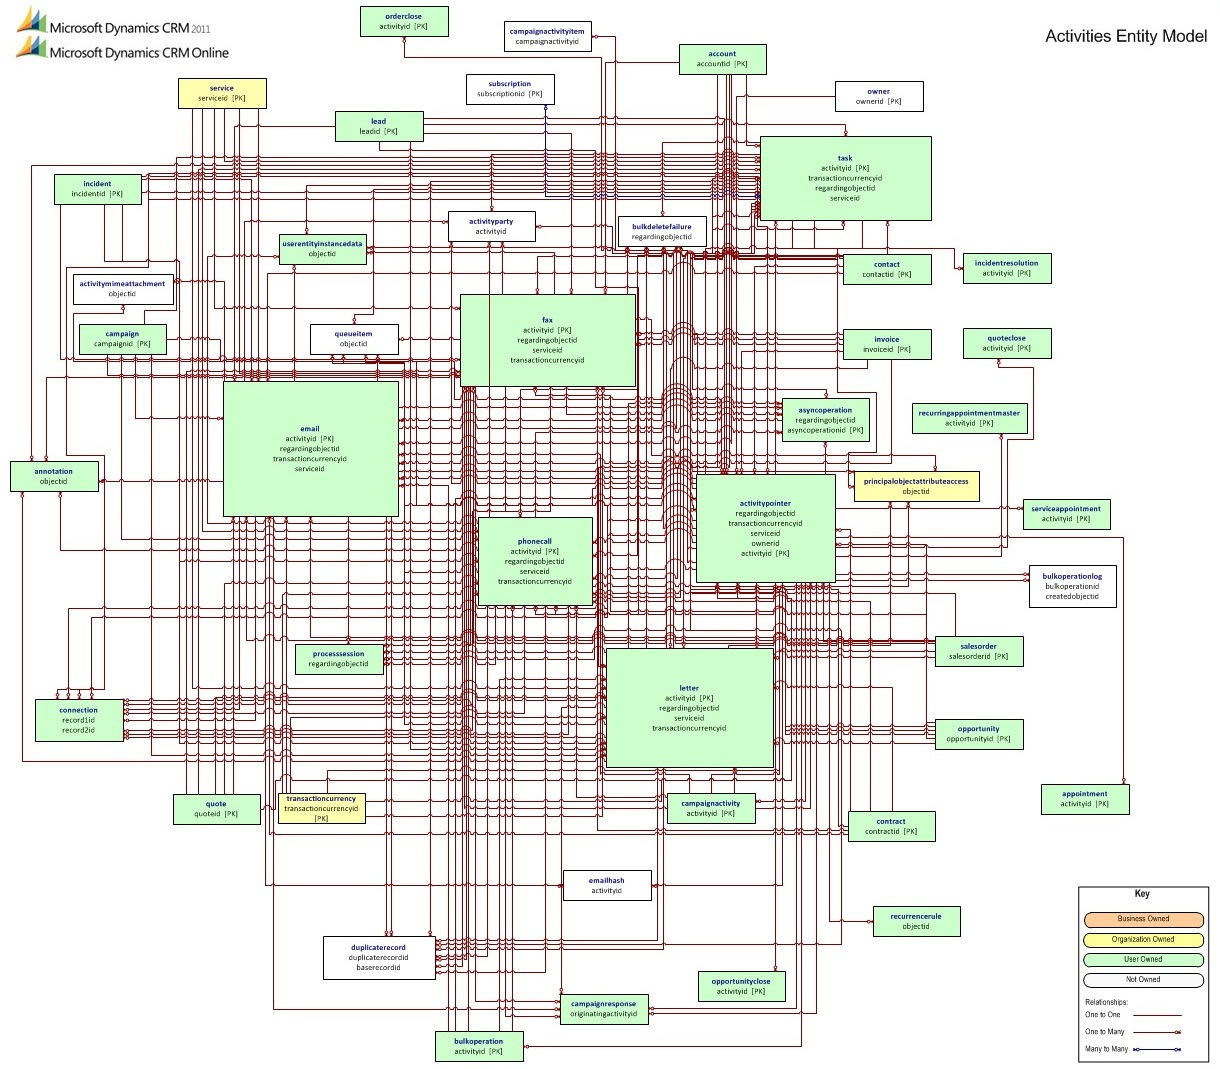 activity microsoft dynamics crm 2011 and microsoft. Black Bedroom Furniture Sets. Home Design Ideas